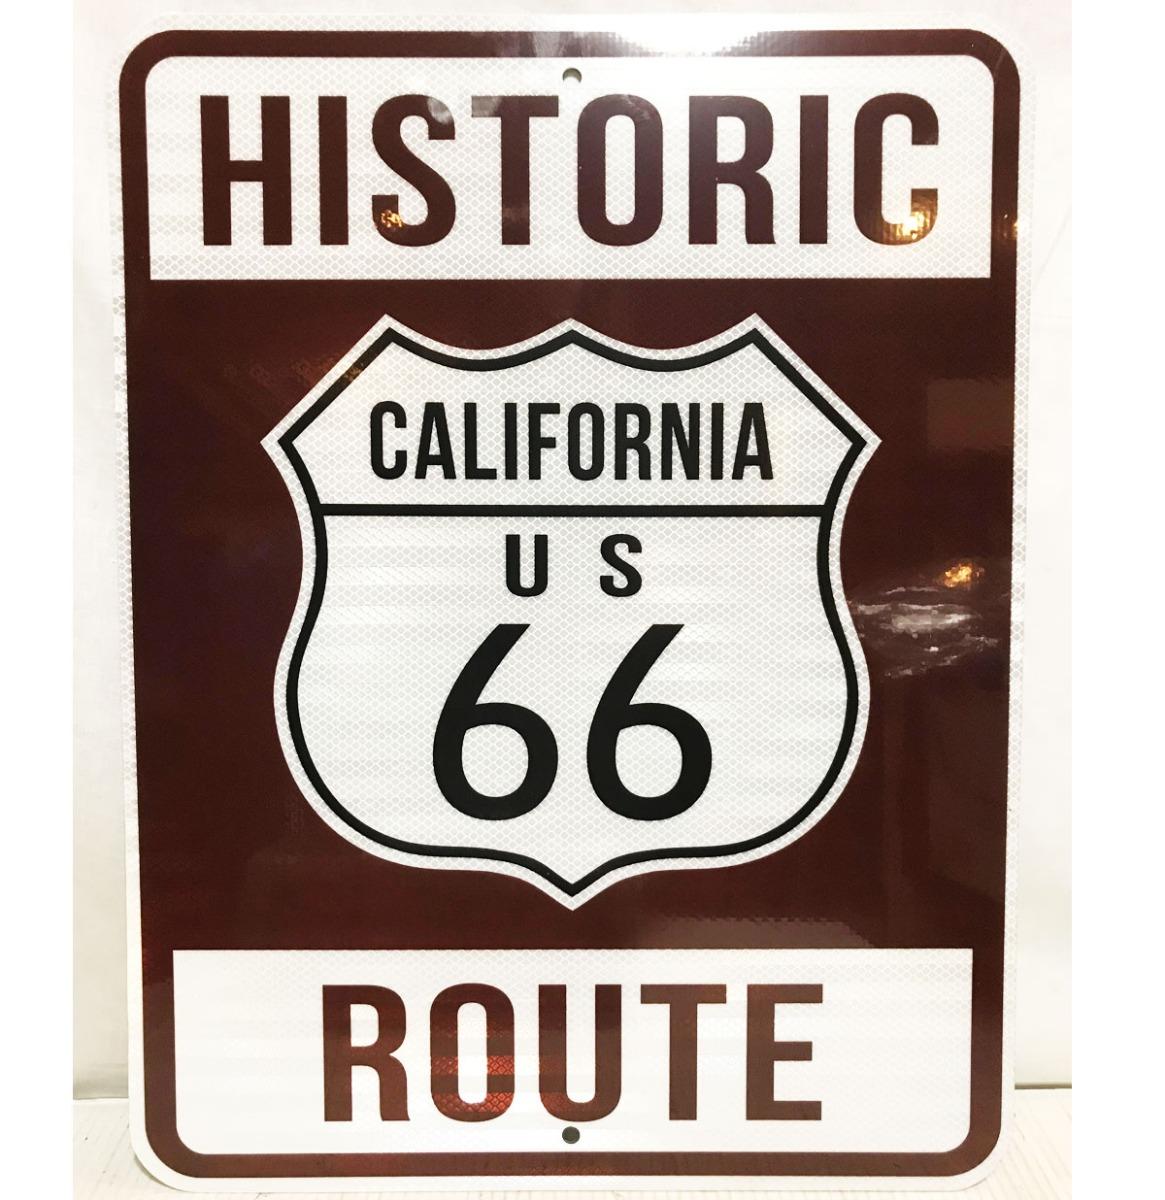 Historic Route 66 California Snelweg Bord - Reflecterend